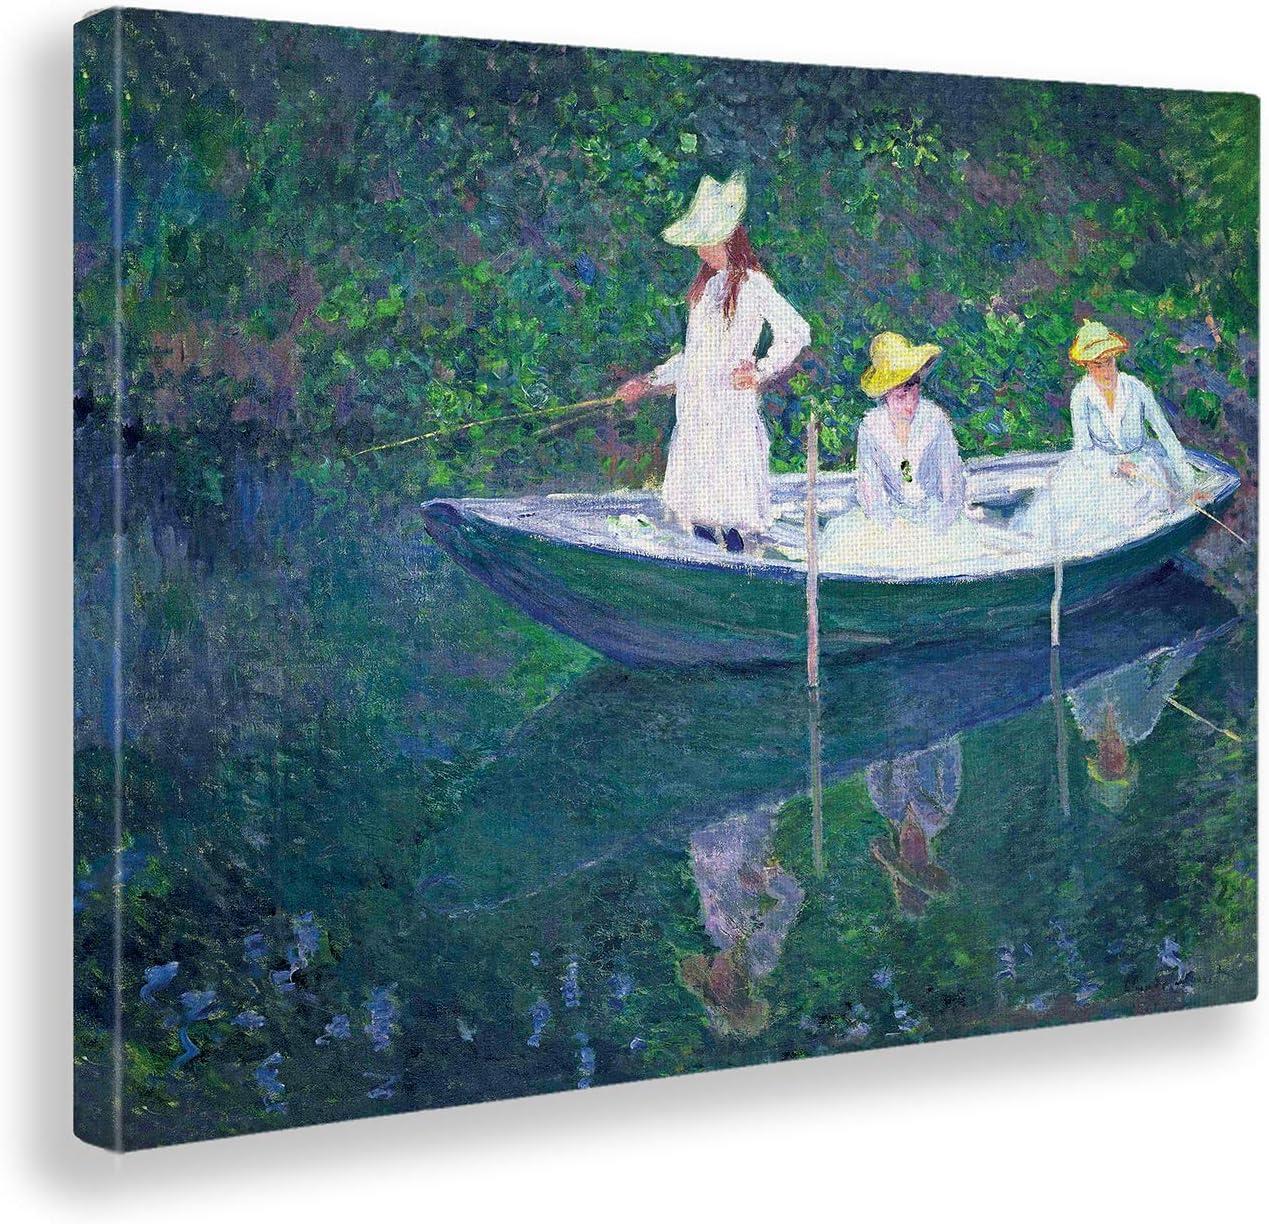 Giallobus - Cuadro - Claude Monet - Pesca en Barco - Estampado en Lienzo - Listo para Colgar - Varios tamaños - 70x50 cm